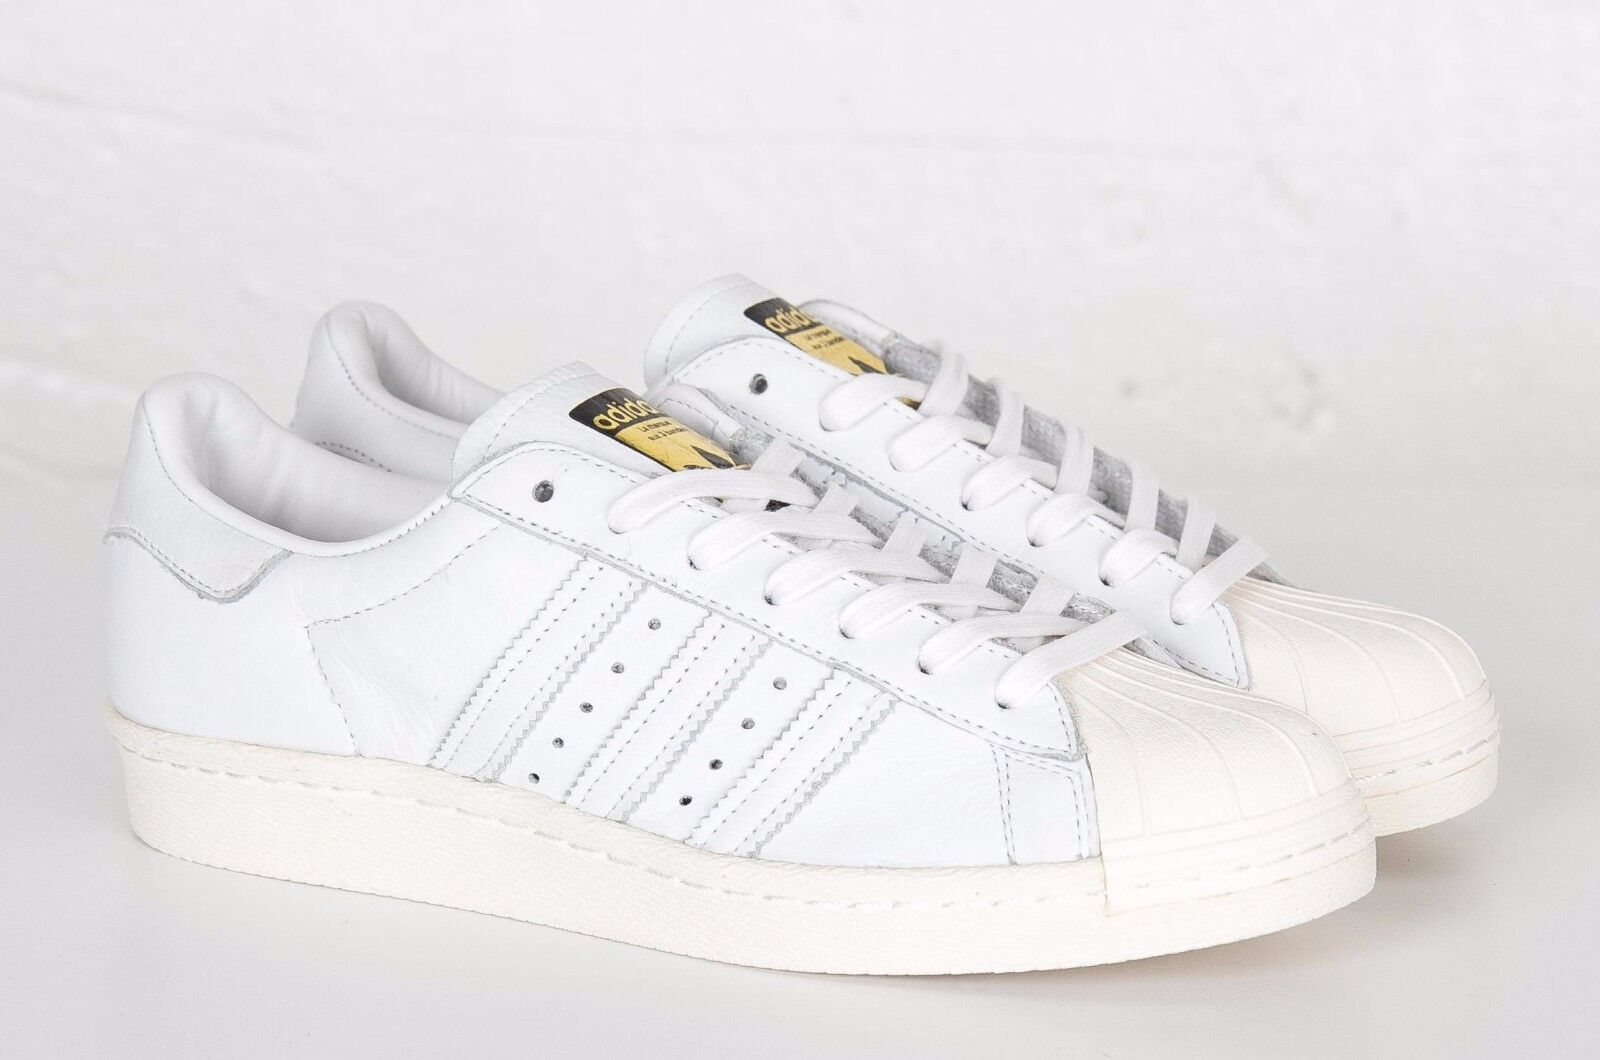 Adidas Originals Superstar 80s DLX Trainers Men's / Women's Leather Shoes White